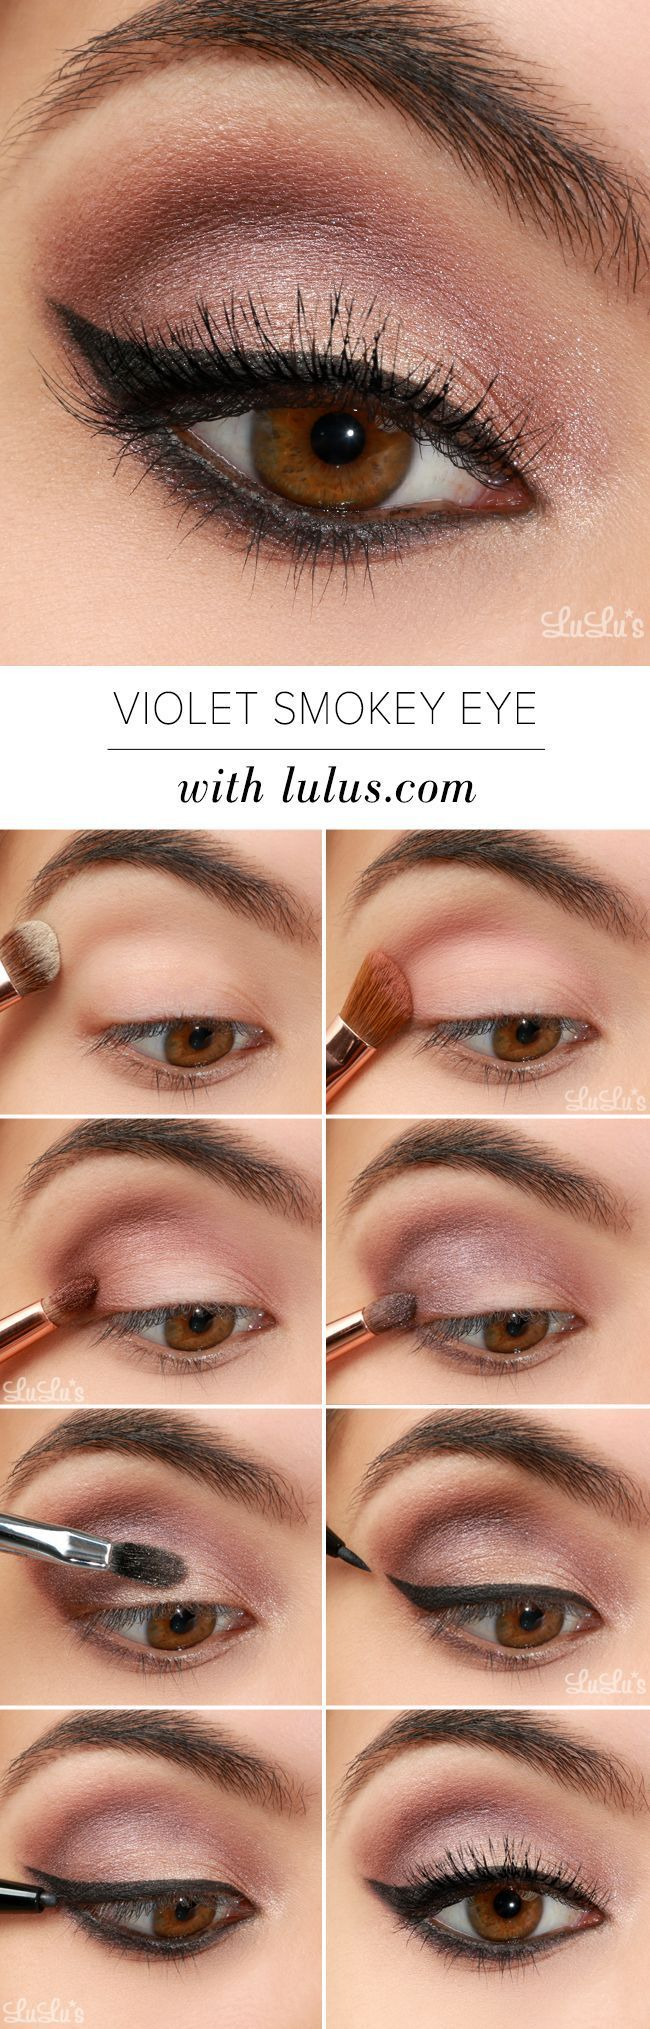 LuLu*s How-To: Violet Smokey Eye Makeup Tutorial.